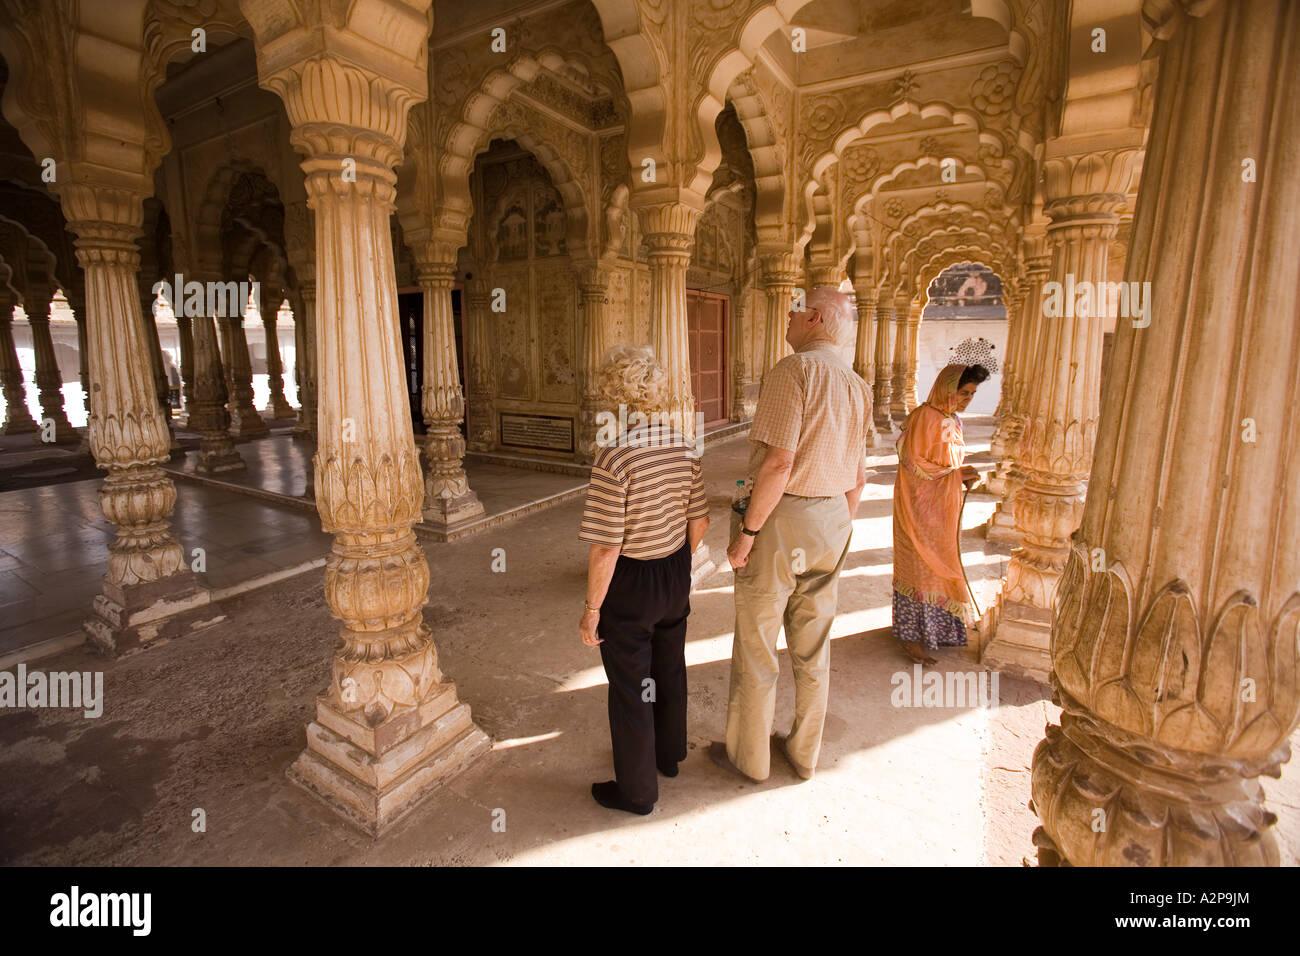 India Rajasthan Jodhpur older western tourists in Maha Mandir the great temple Stock Photo